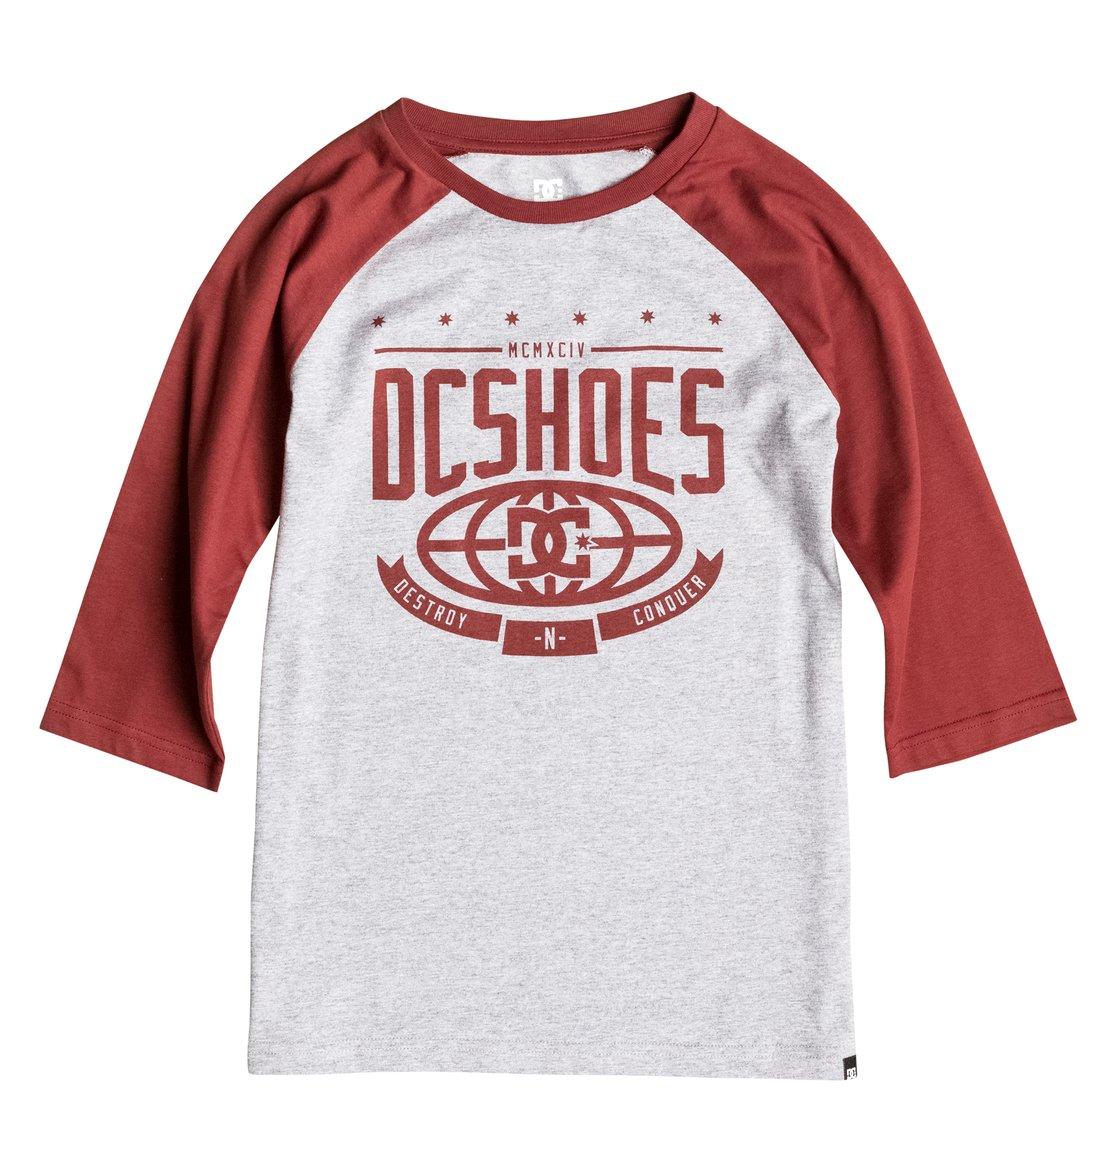 The Creed Raglan T-Shirt